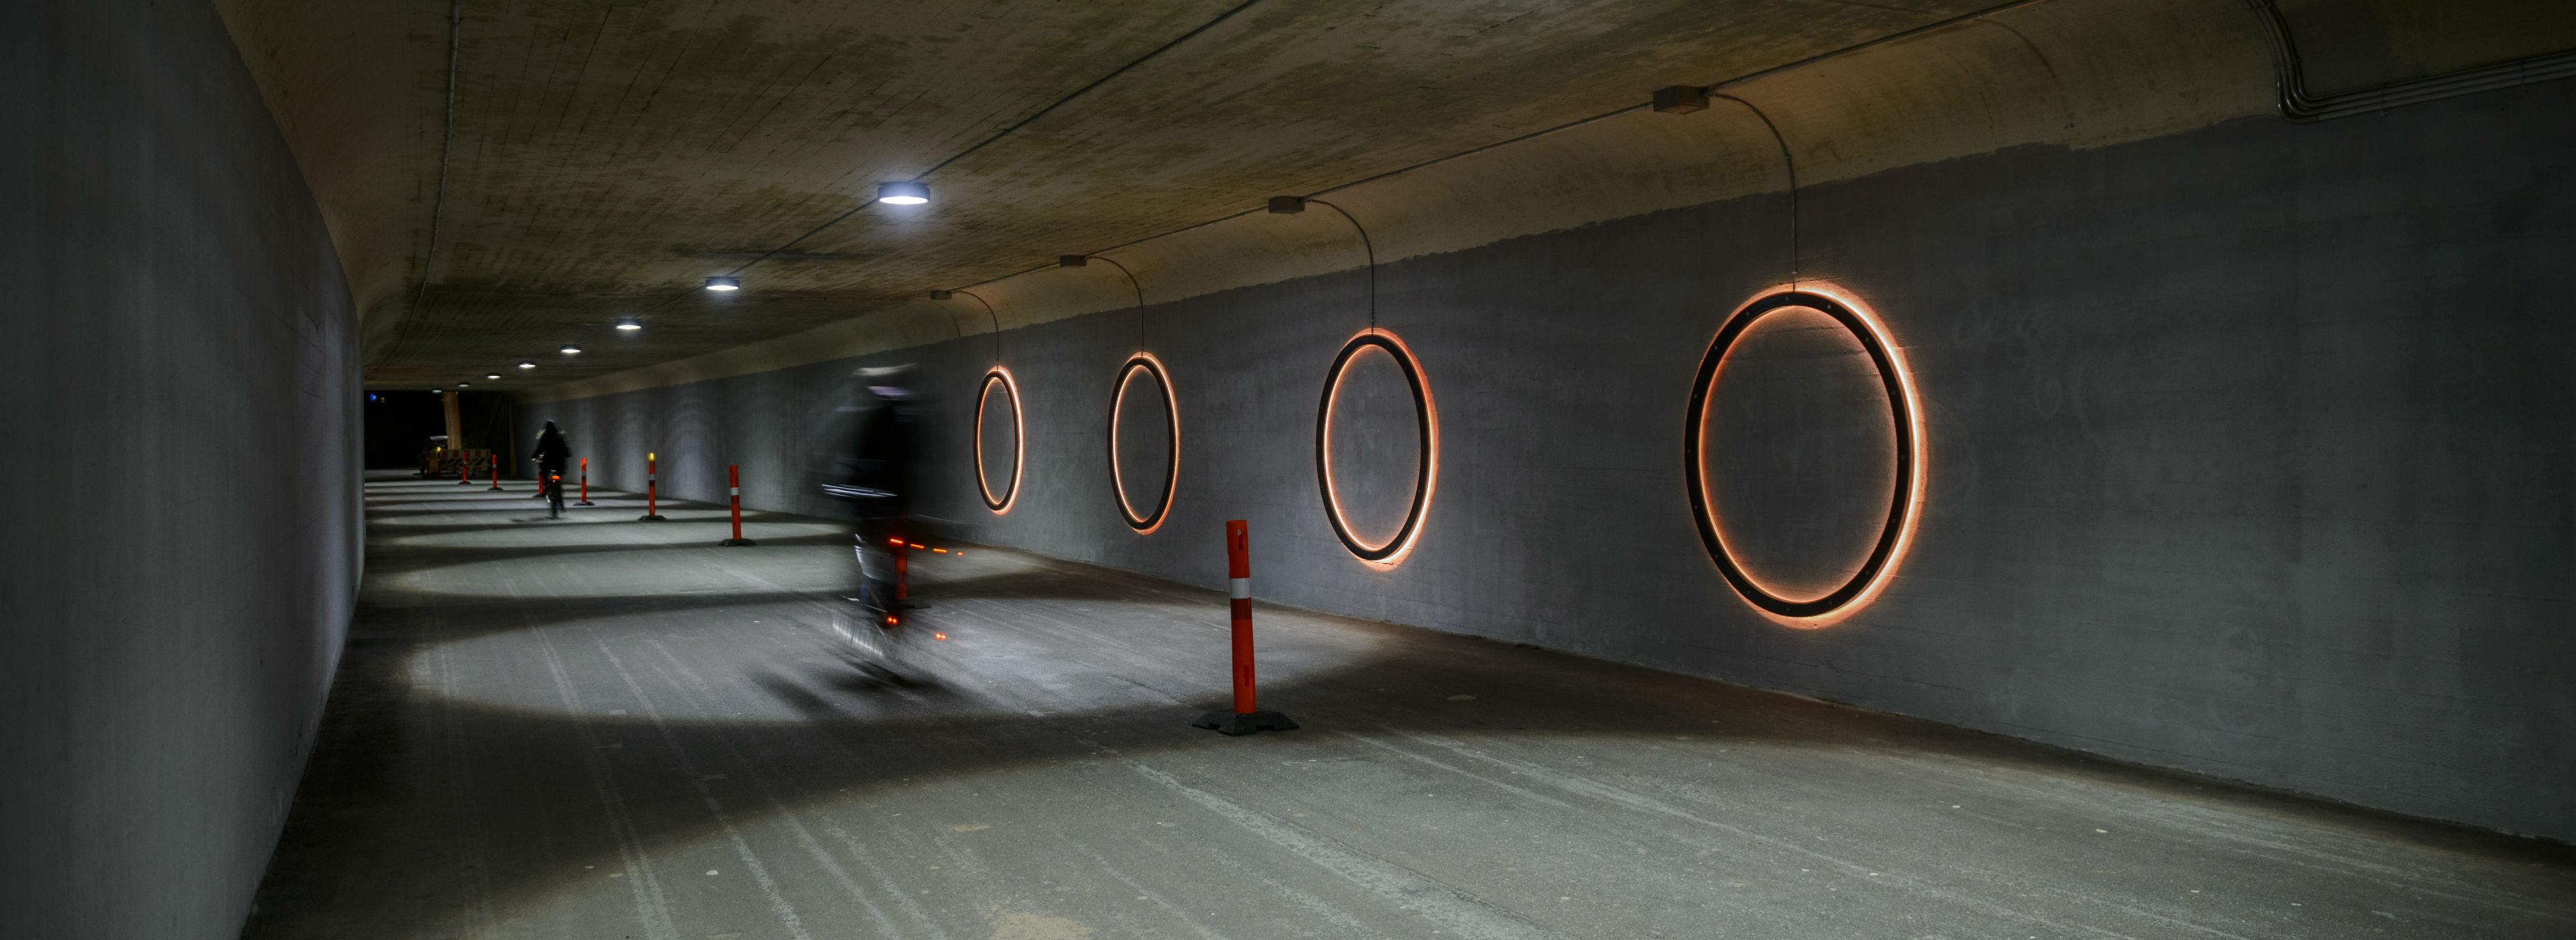 <br />Foto: Supercykelstier Region Hovedstaden